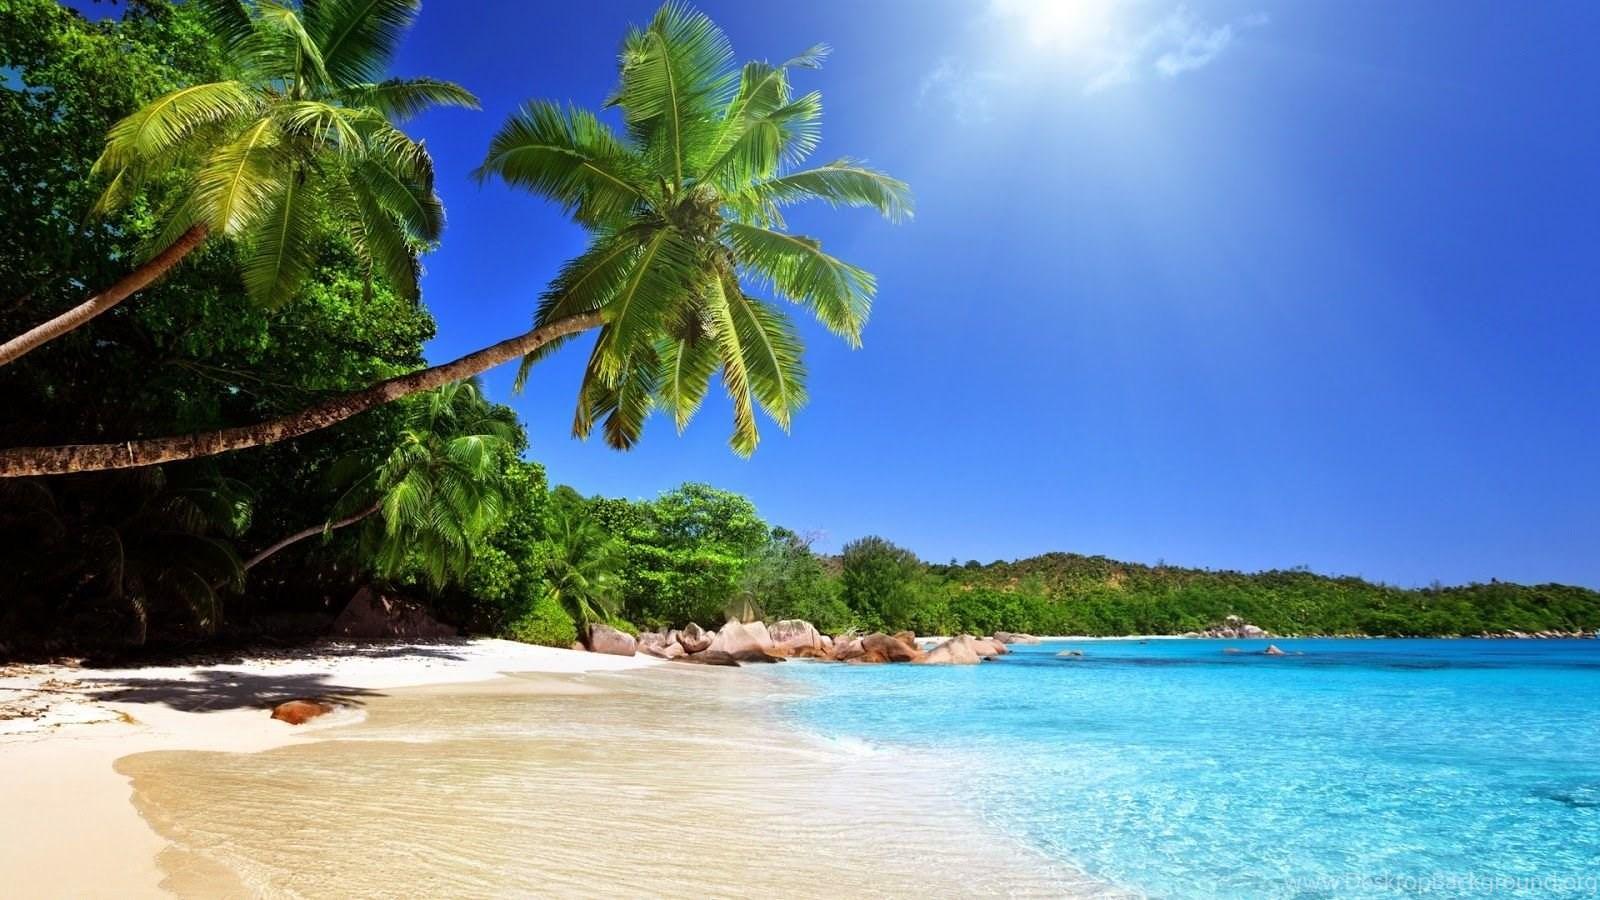 Tropical blue sea clear sky white sand beach view theme hd 1080p popular voltagebd Choice Image